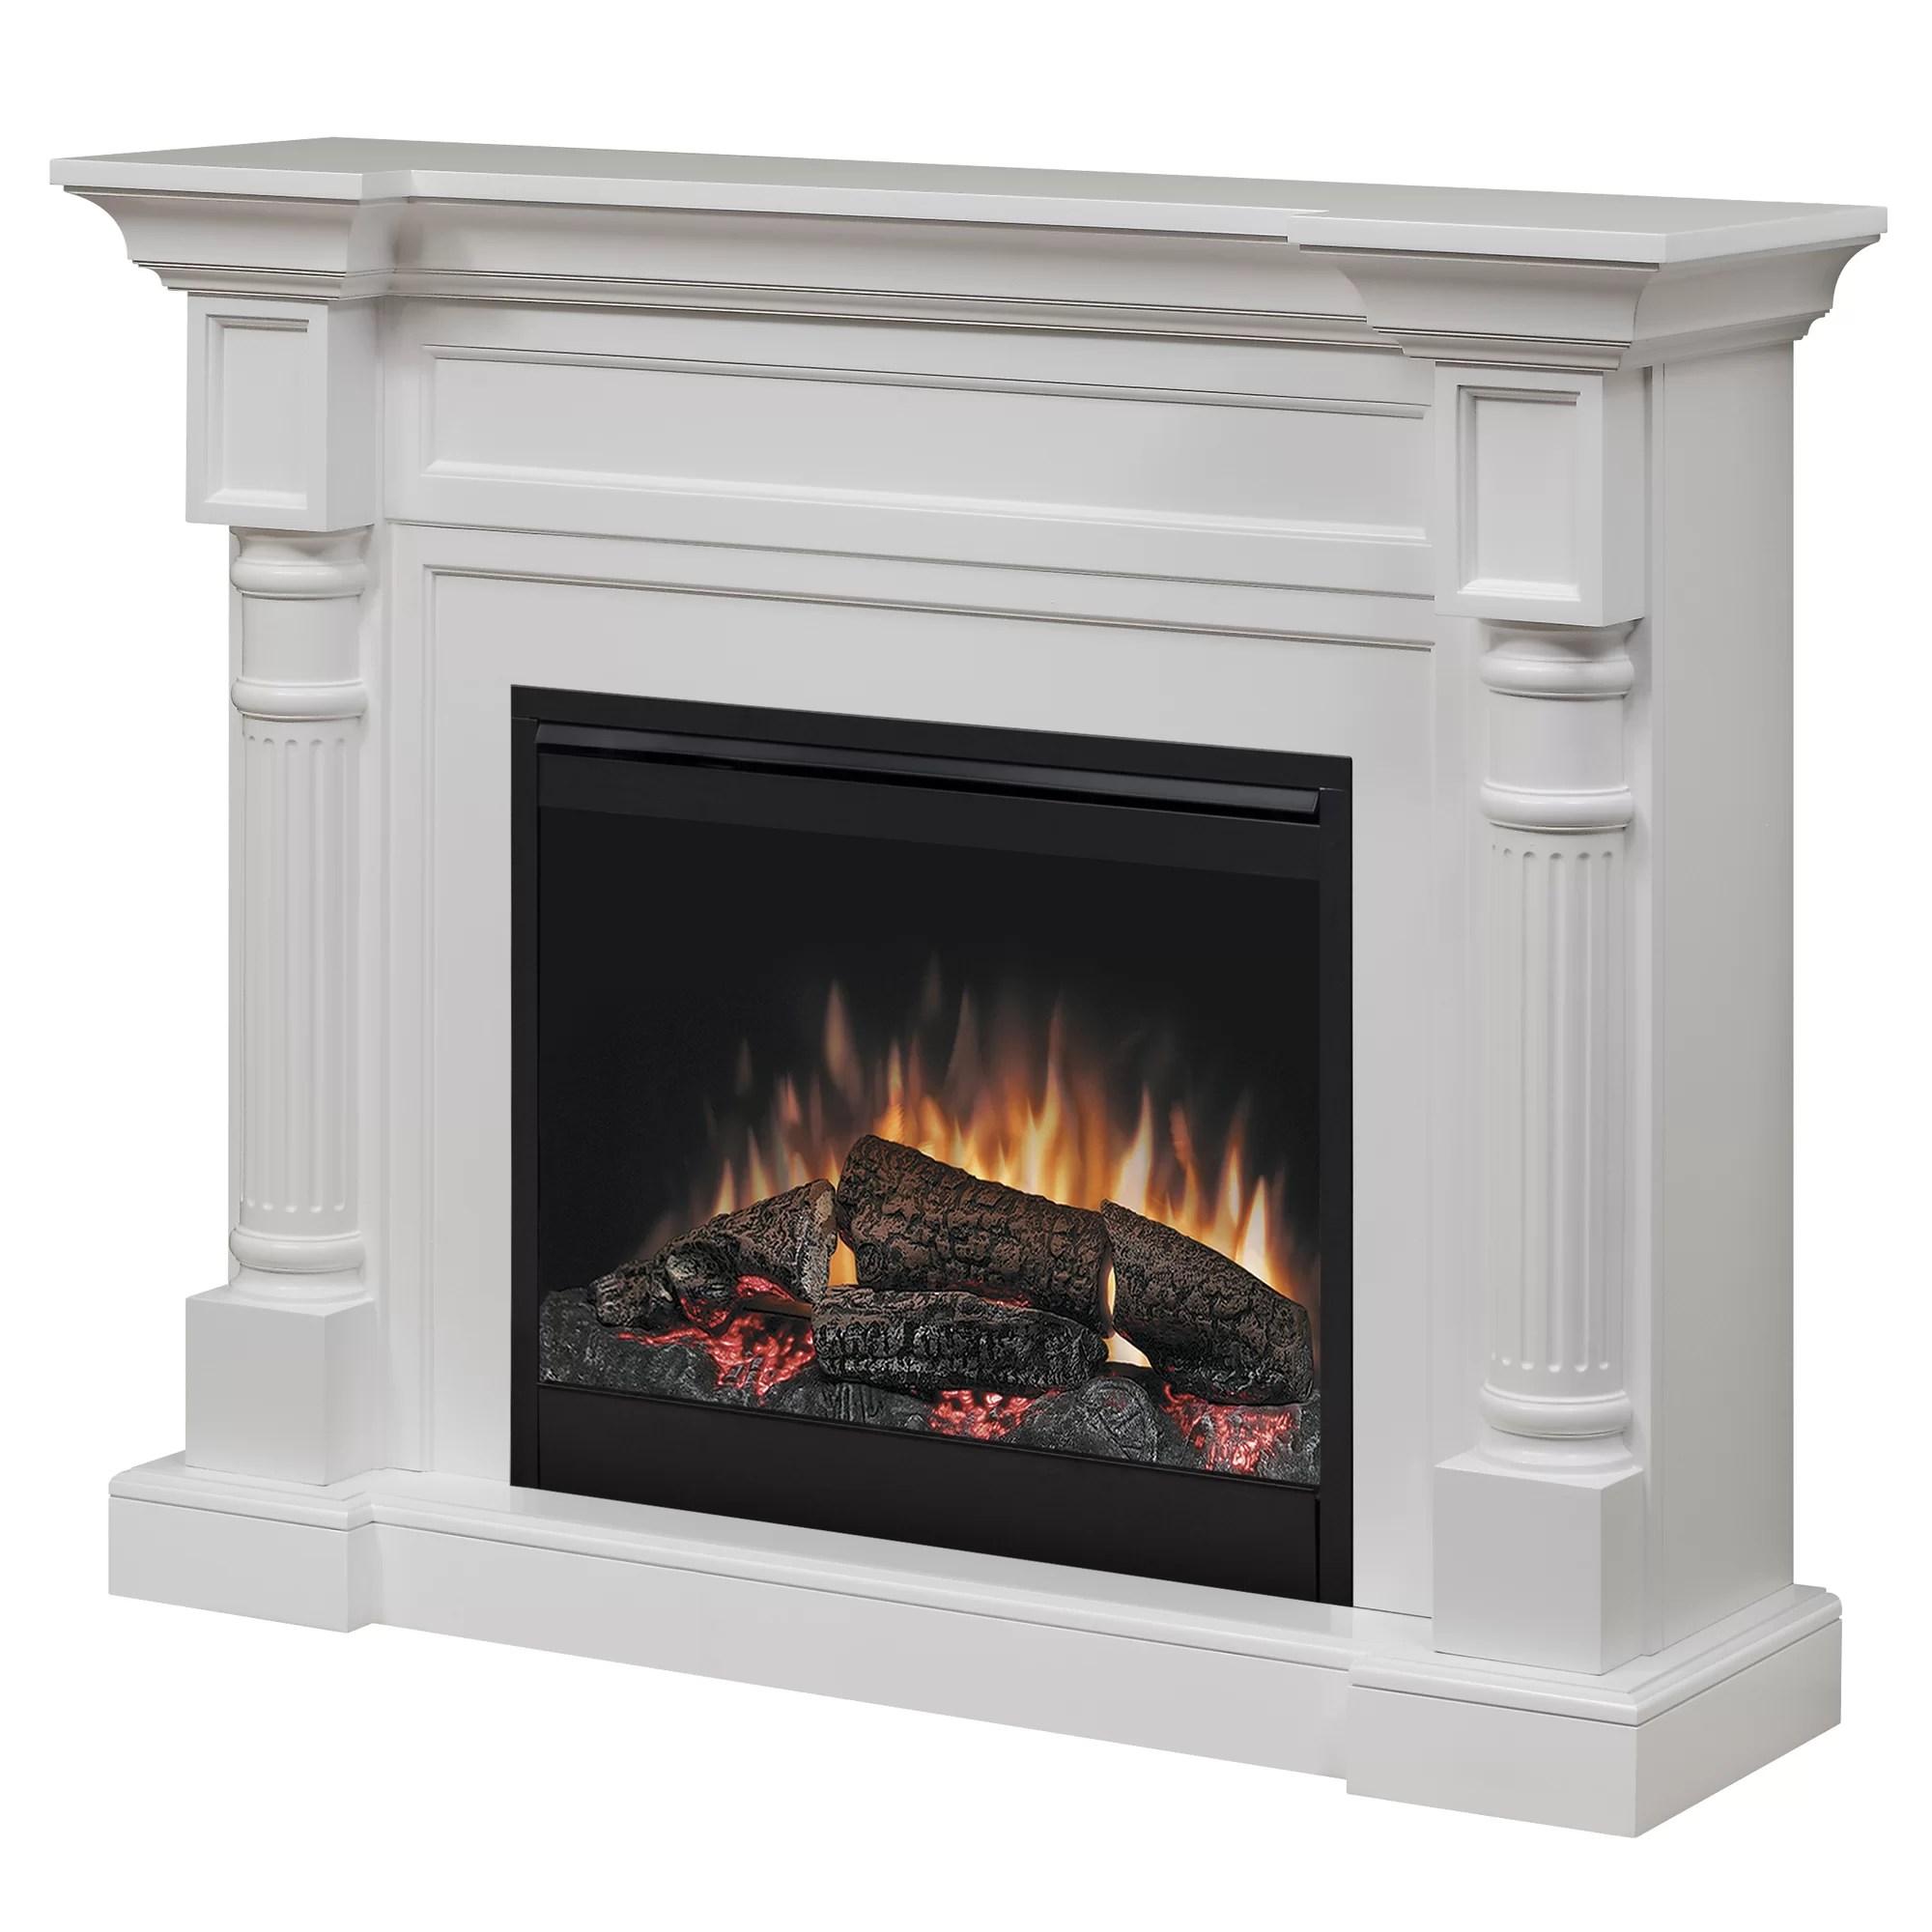 Dimplex Winston Electric Fireplace